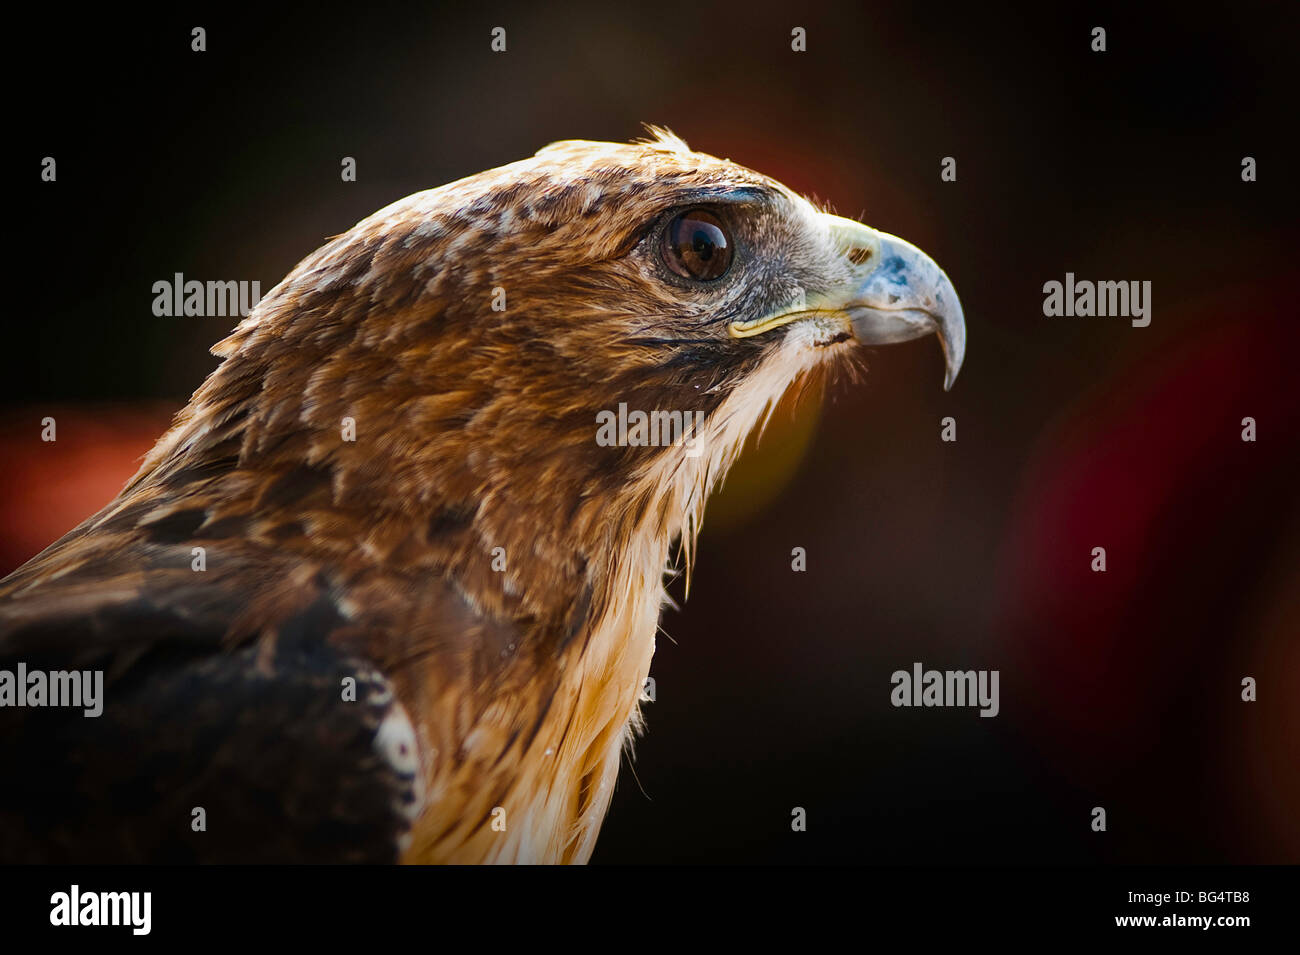 Hunting falcon - Stock Image